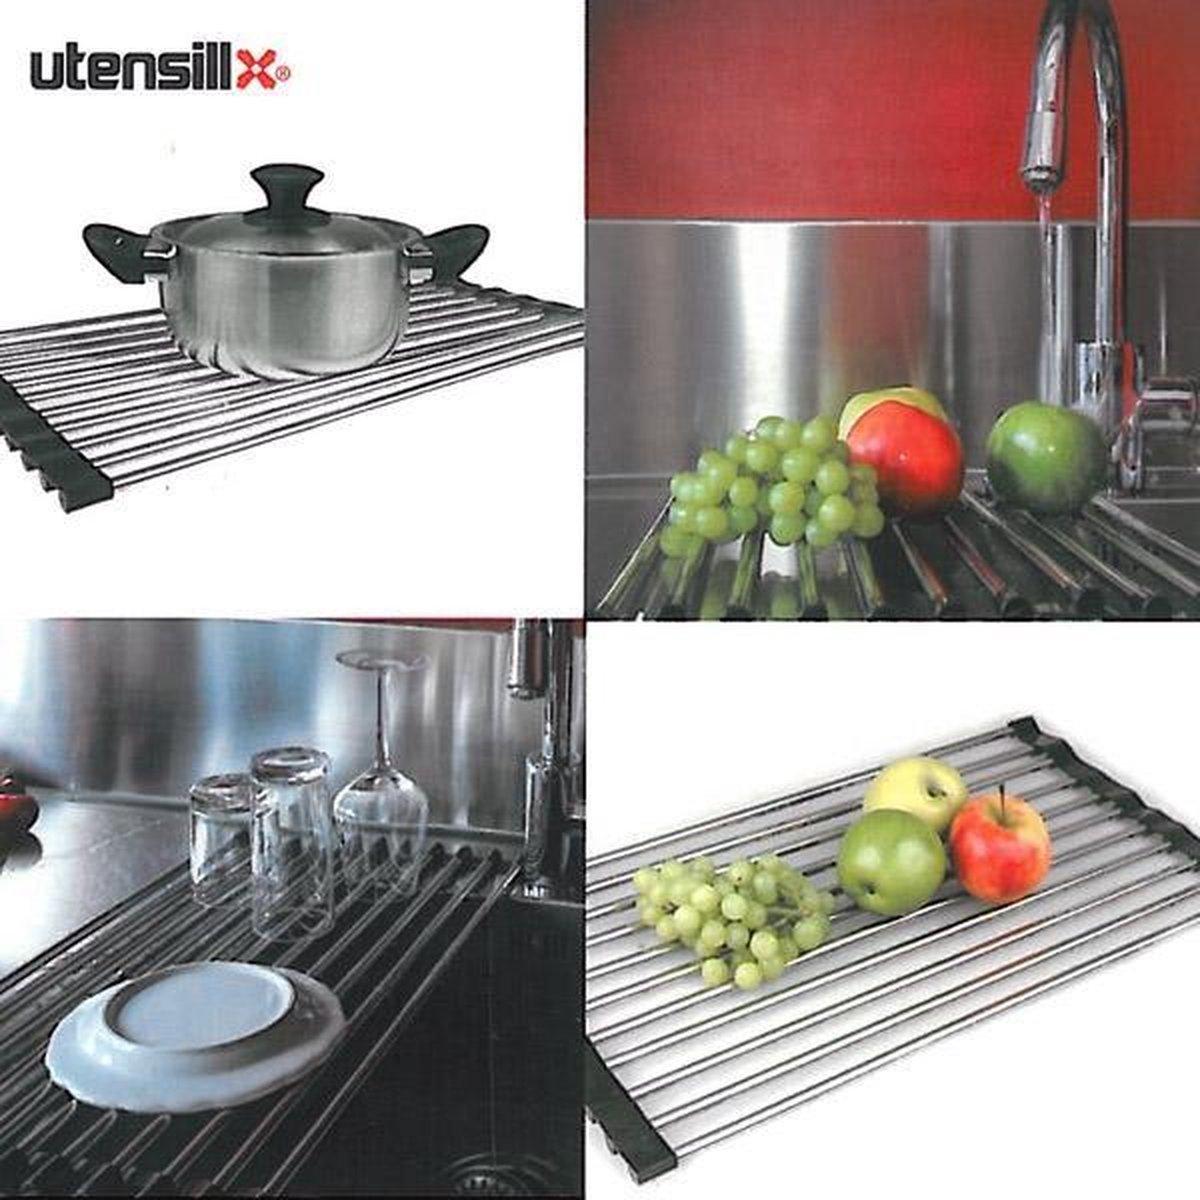 Utensill multifunctioneel keukenrek - Afdruiprek - Pannen onderzetter - Utensill